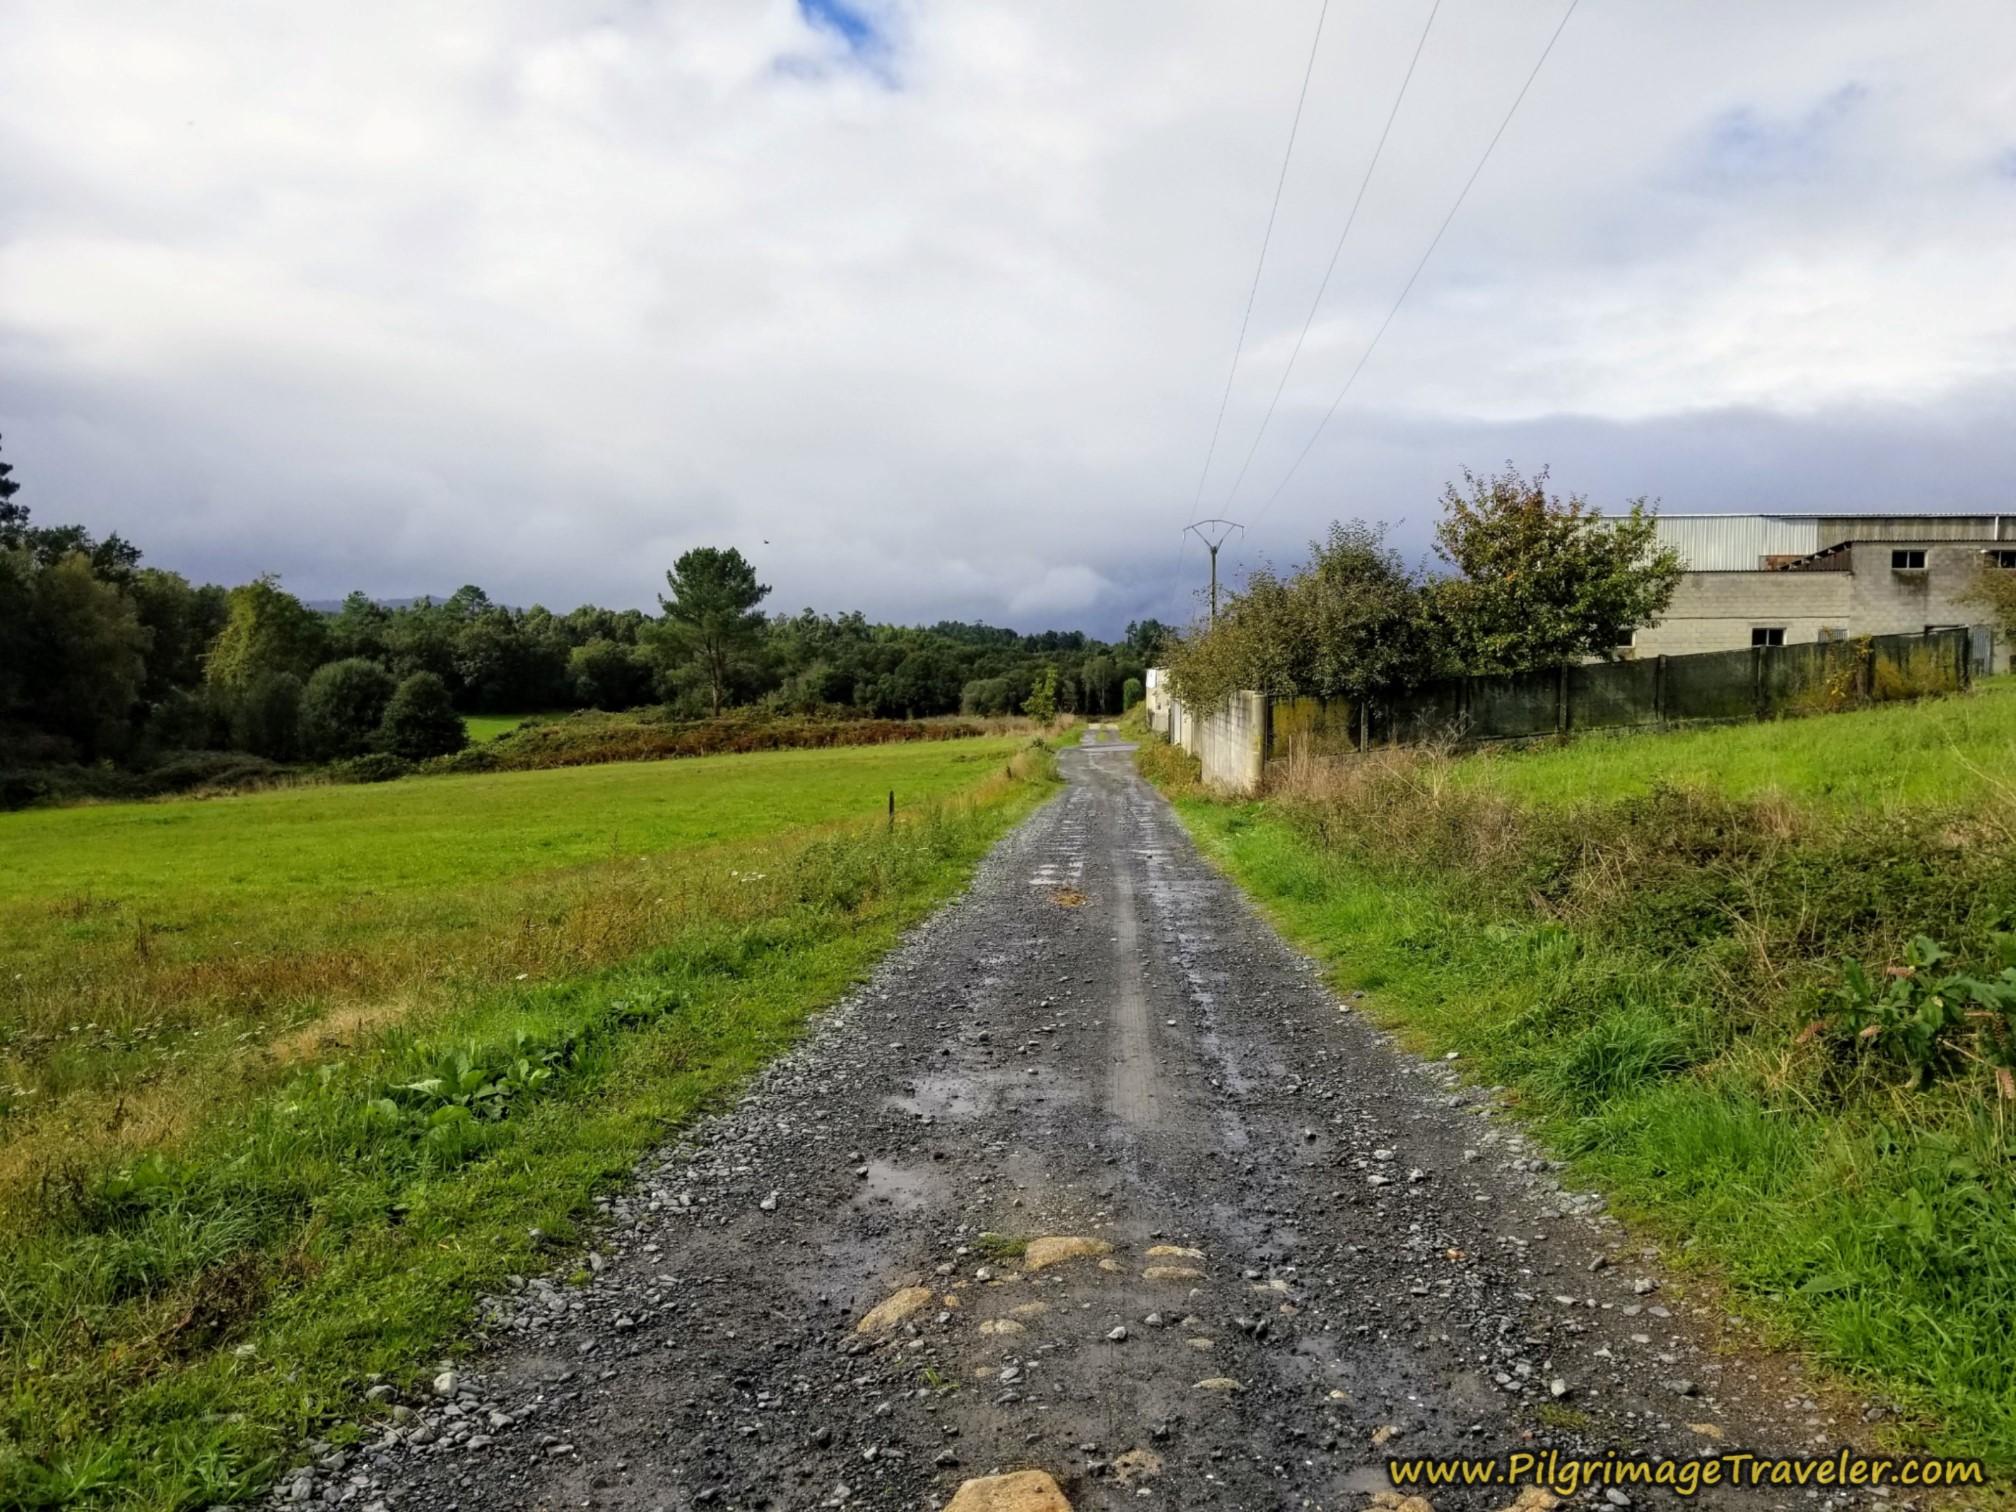 Continue Down Scrapyard Lane